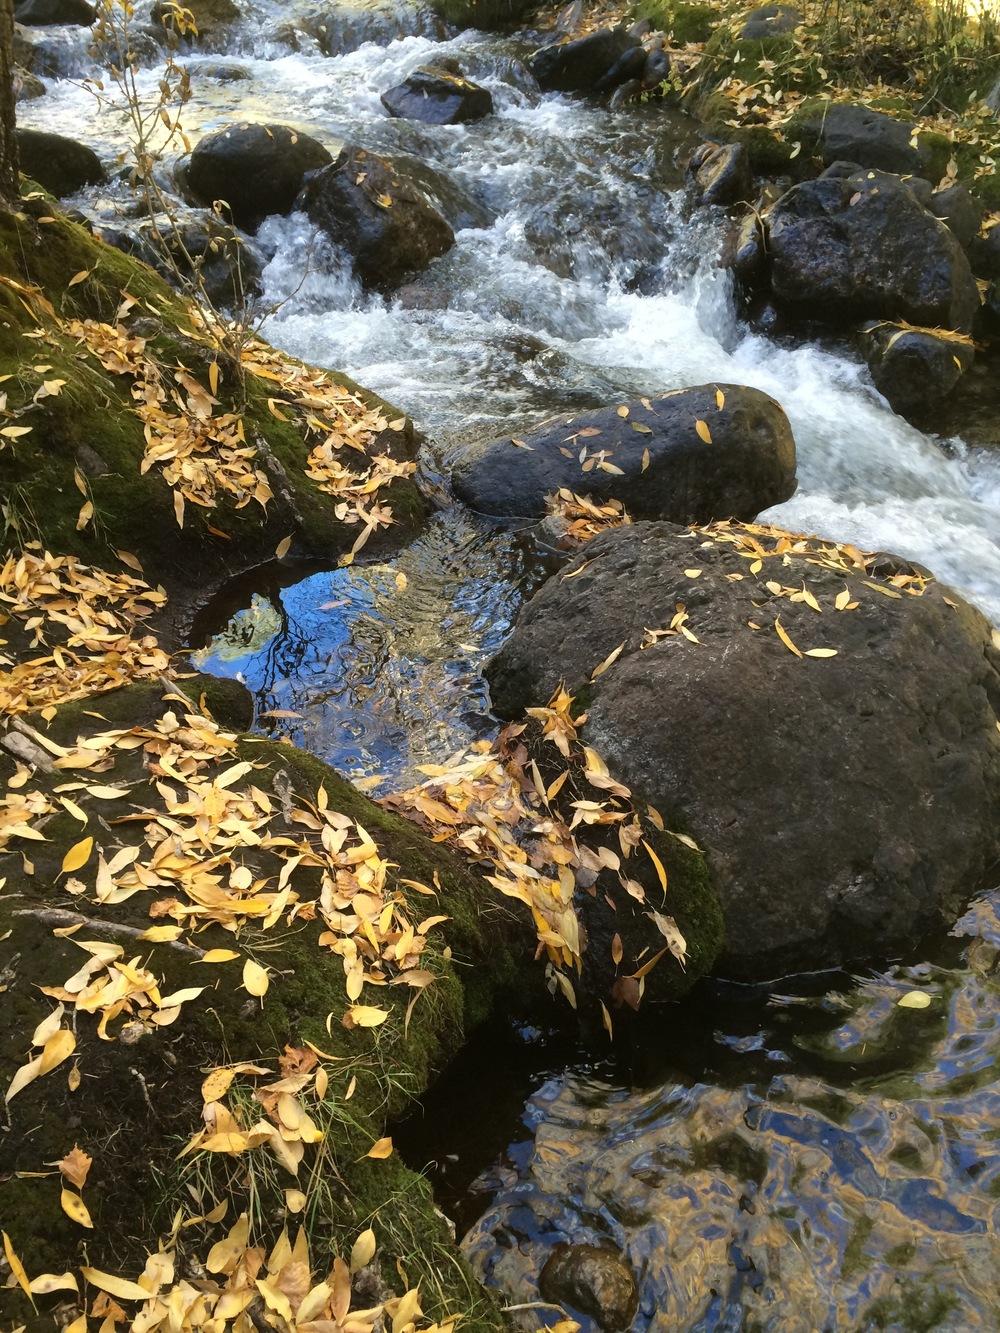 10-24-14 n. crestone creek landscape.jpg